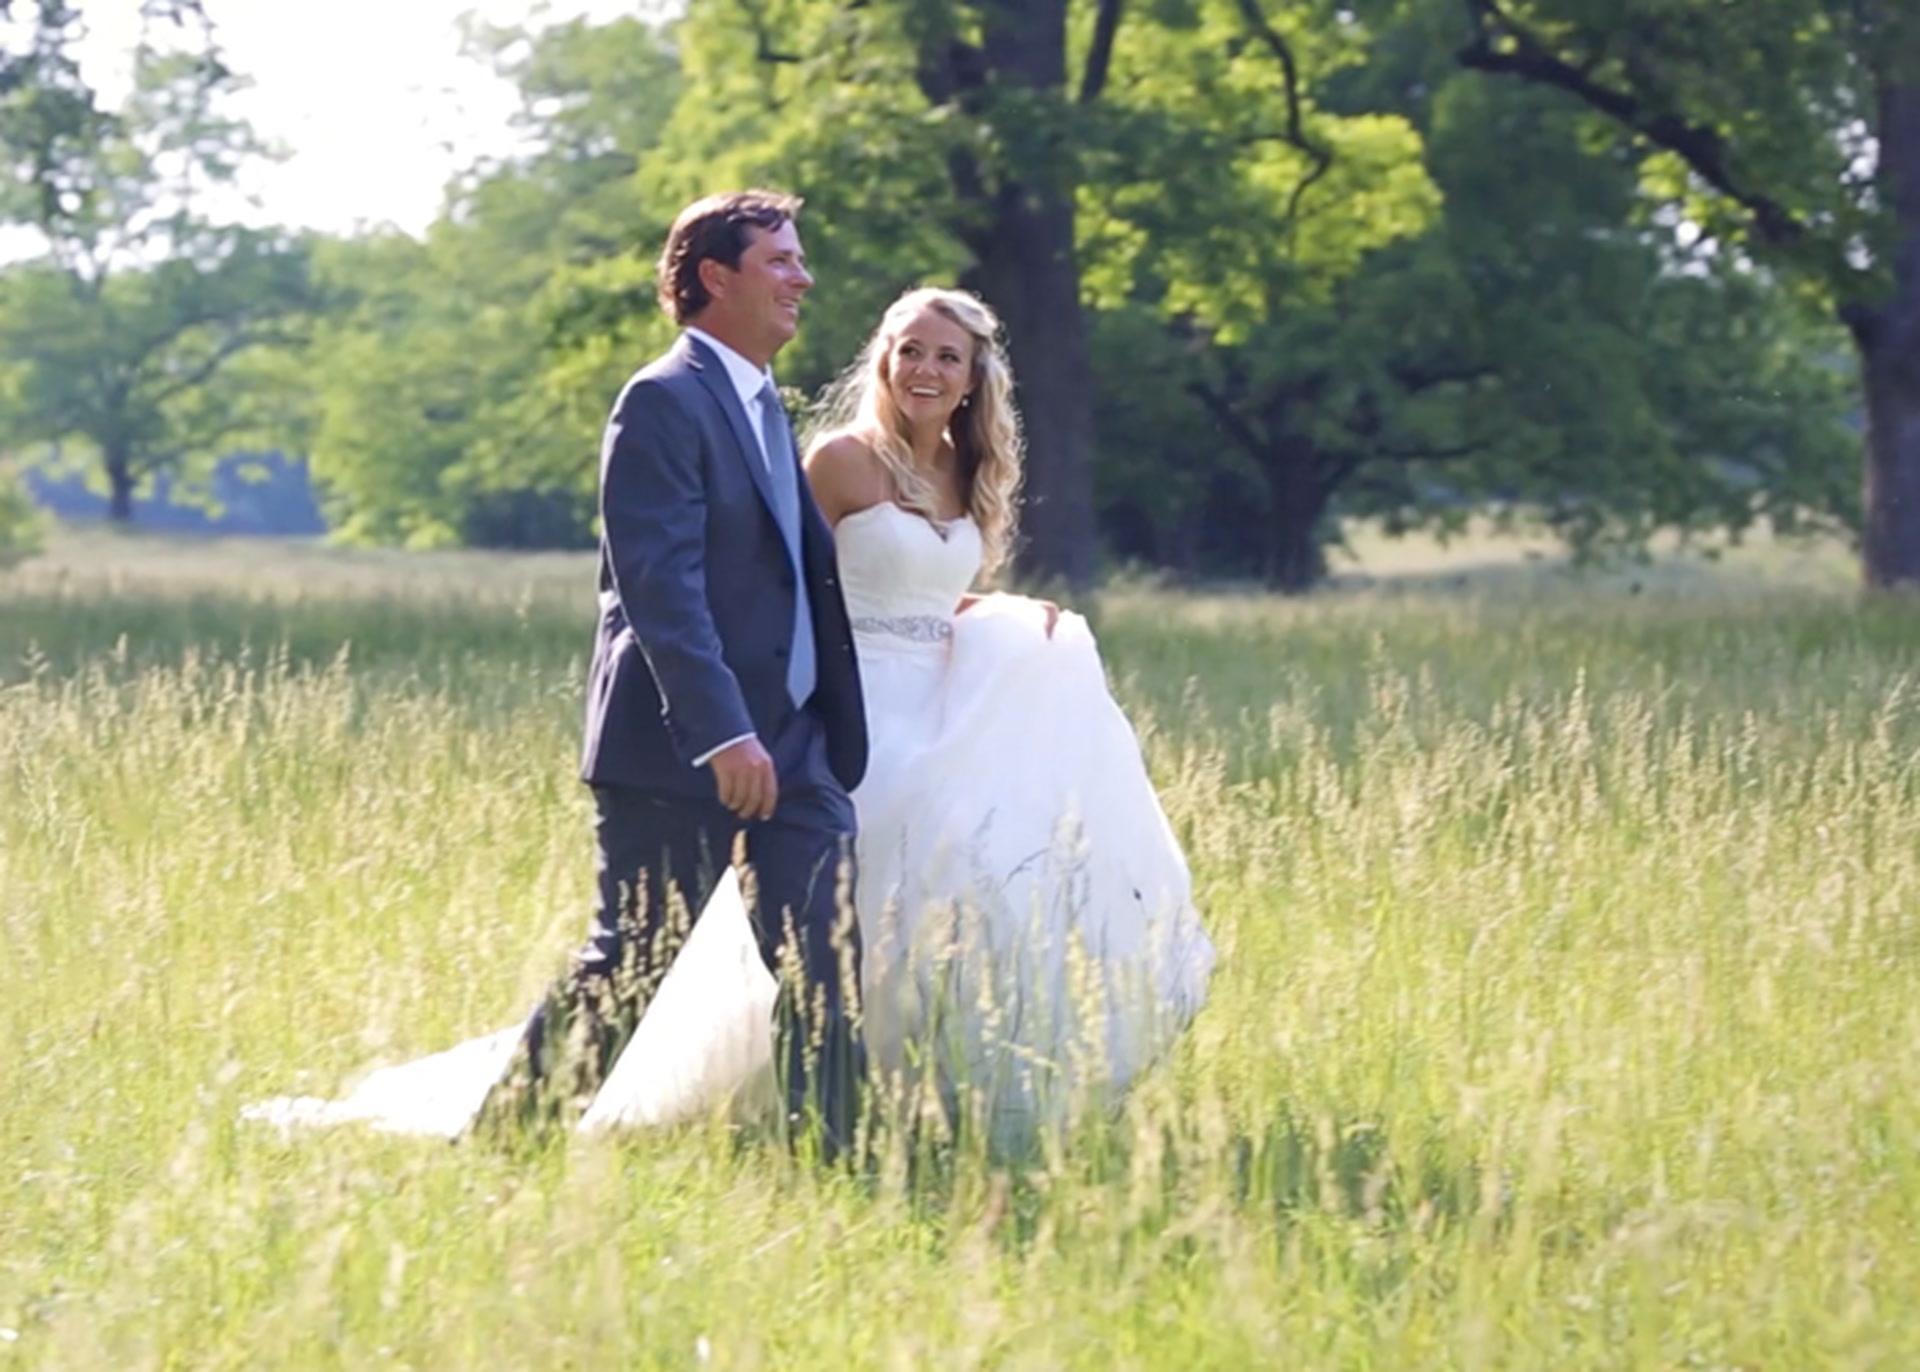 Taylor + Natalie | Arnoldsville, Georgia | Cloverleaf Farm